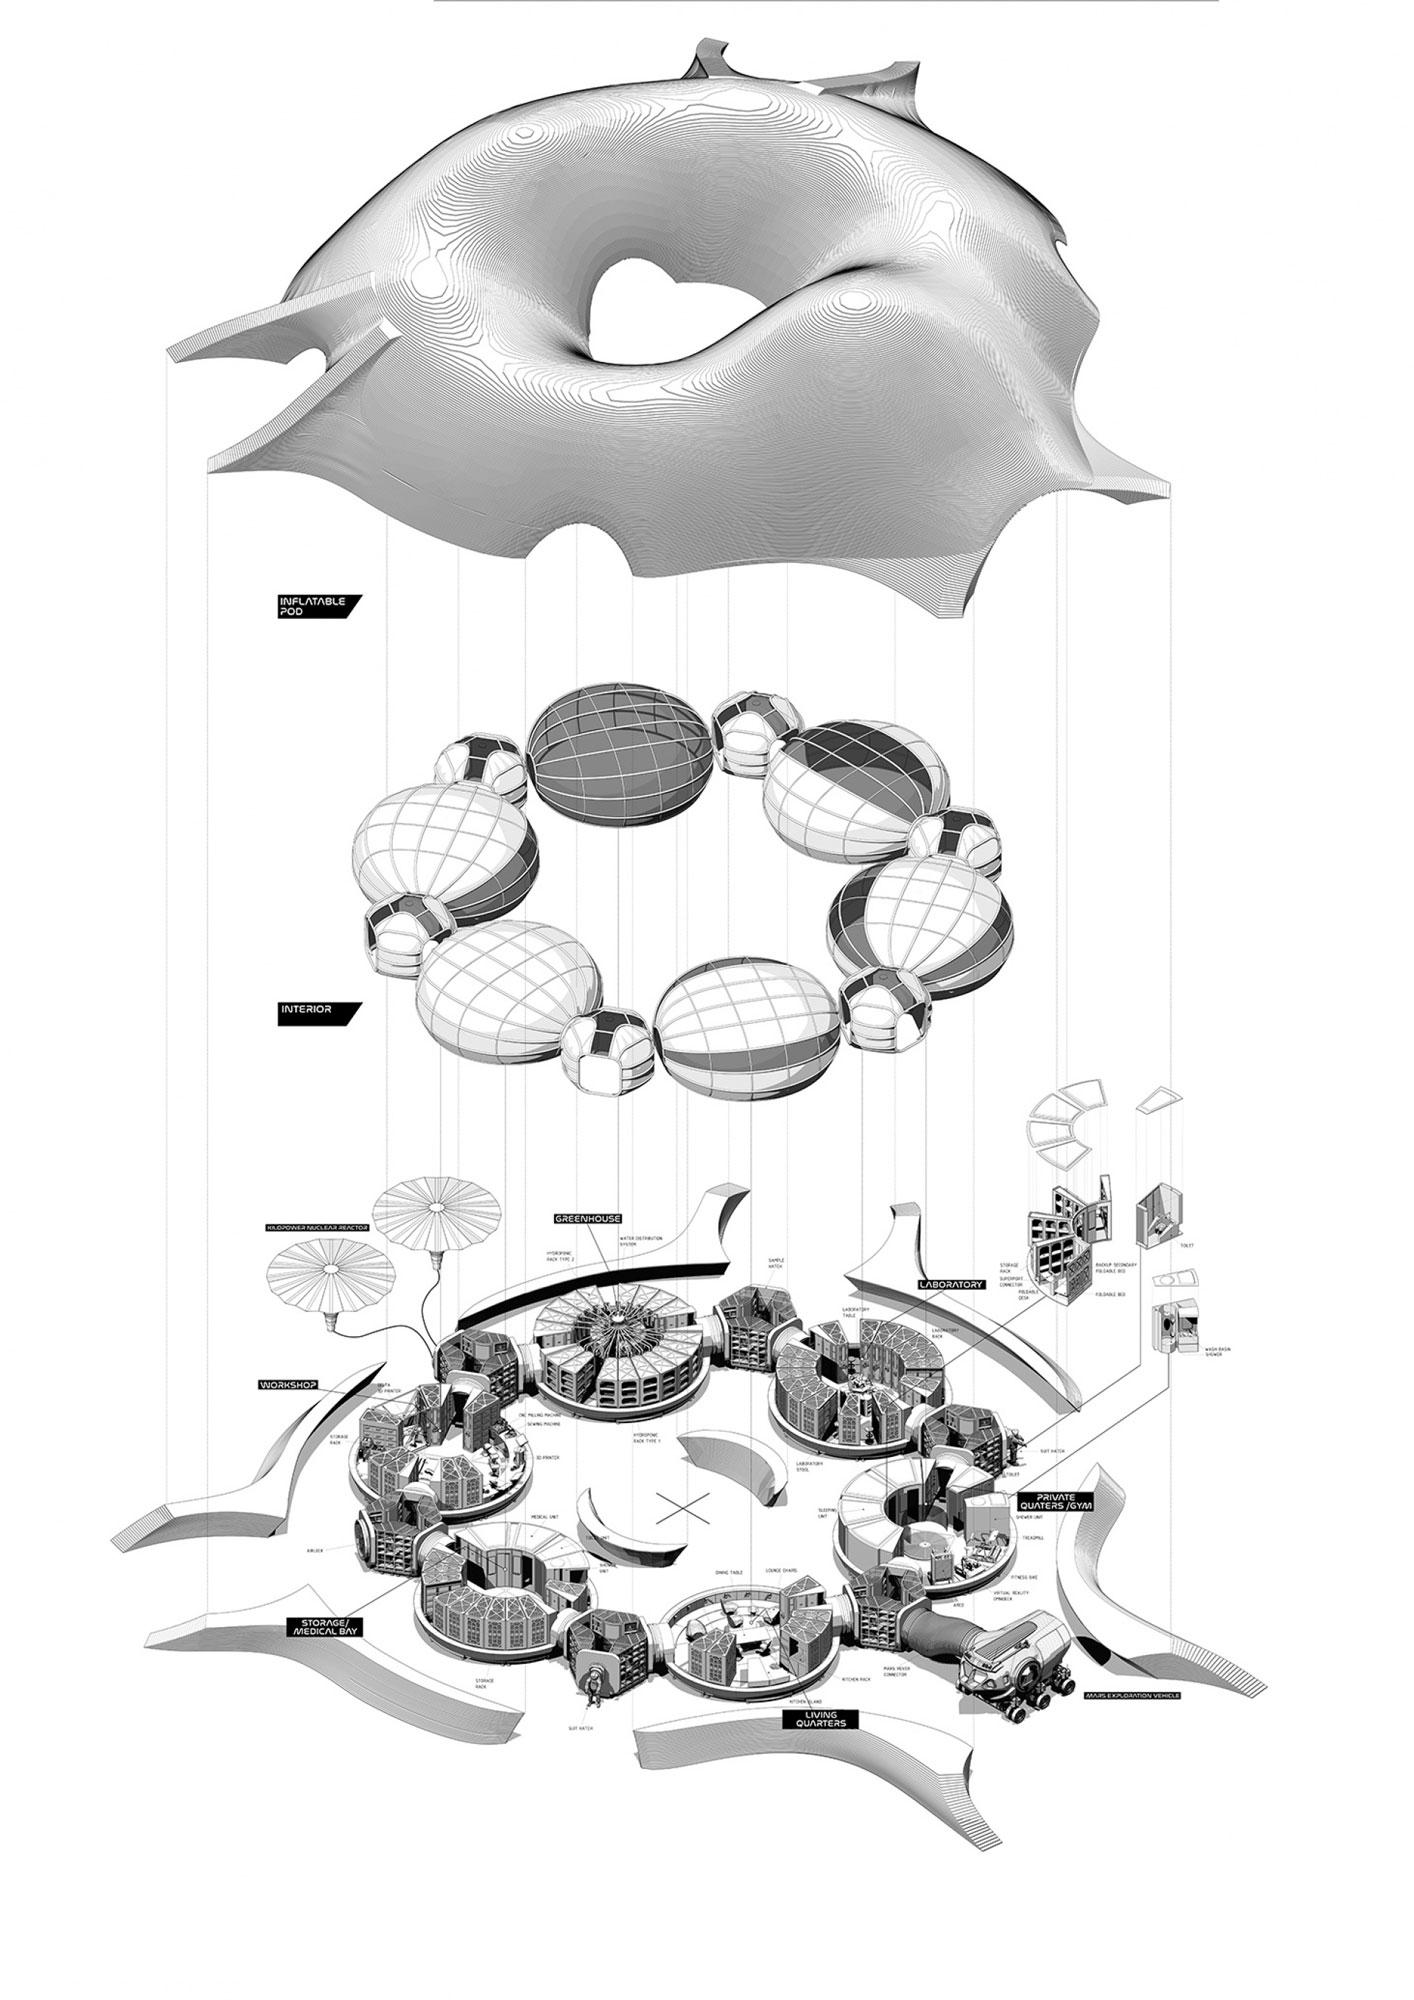 Architecture on Mars © Hassell Studio